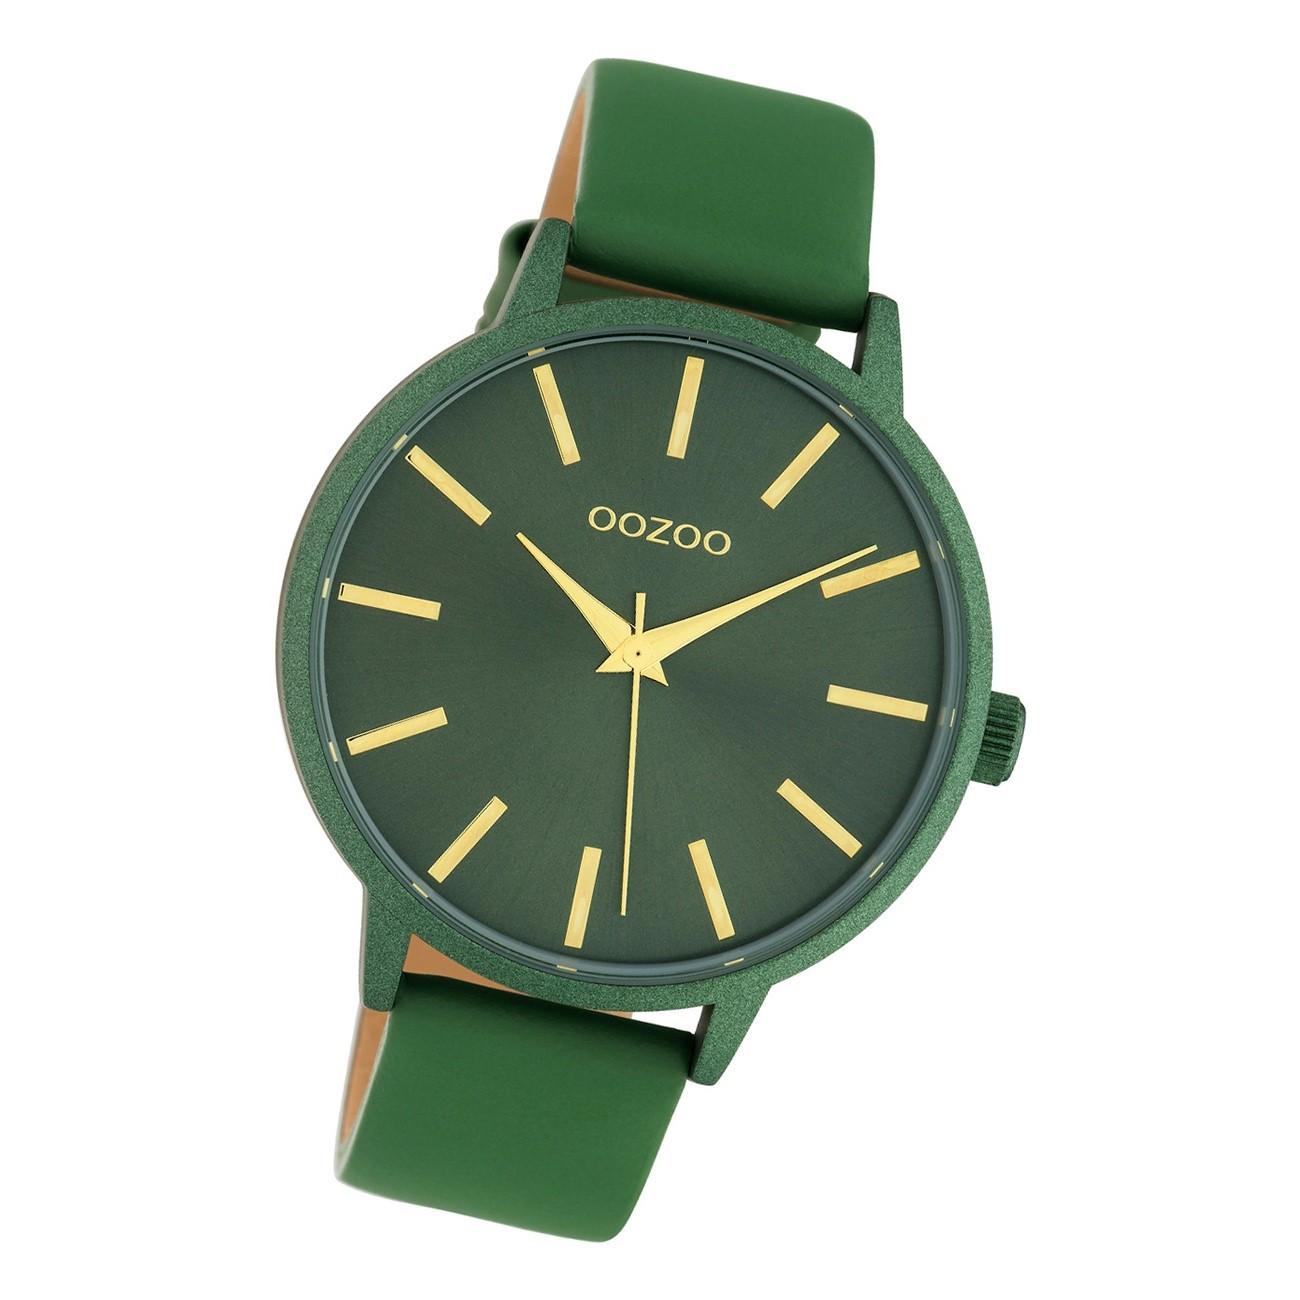 Oozoo Damen Armbanduhr Timepieces C10616 Analog Leder grün UOC10616